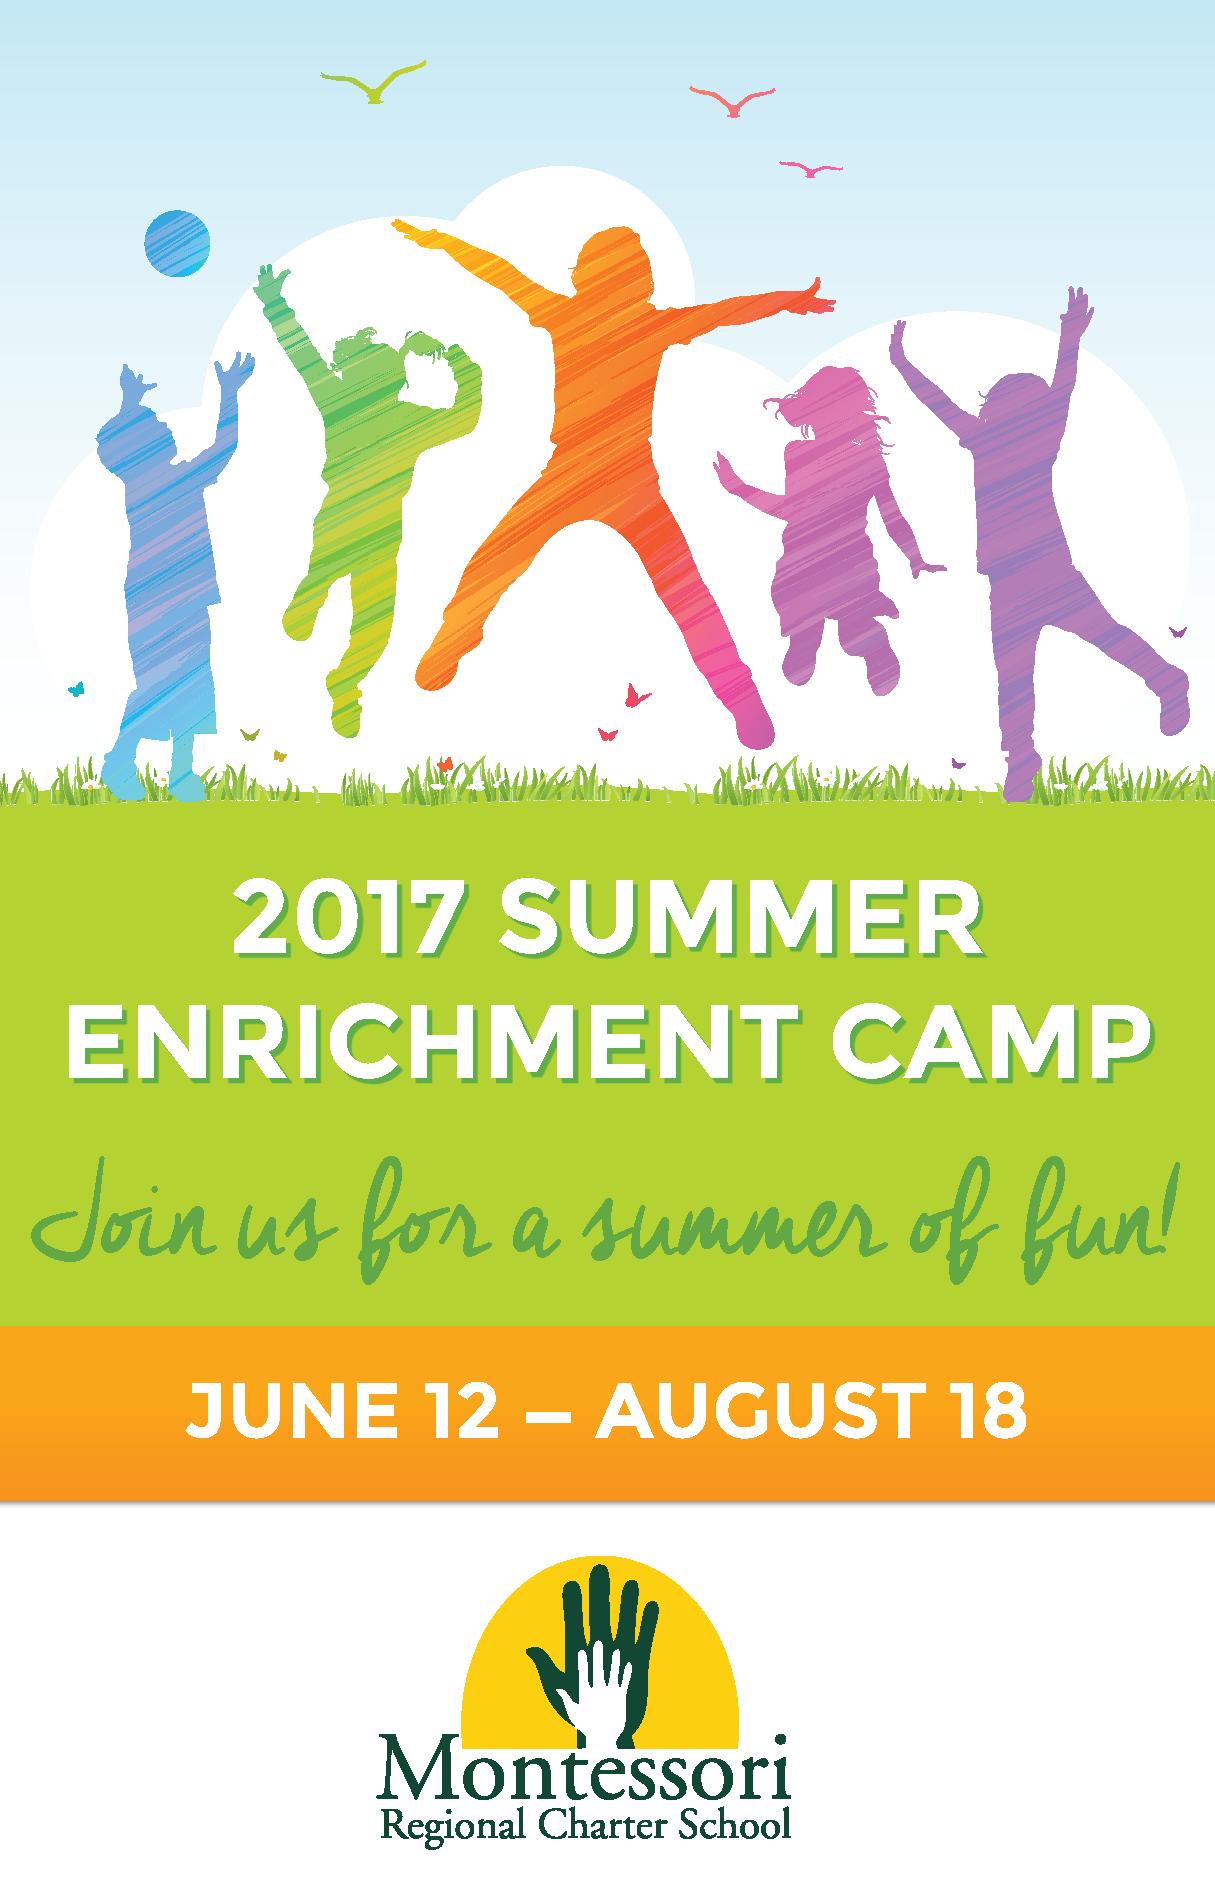 MRCS Summer Camp 2017